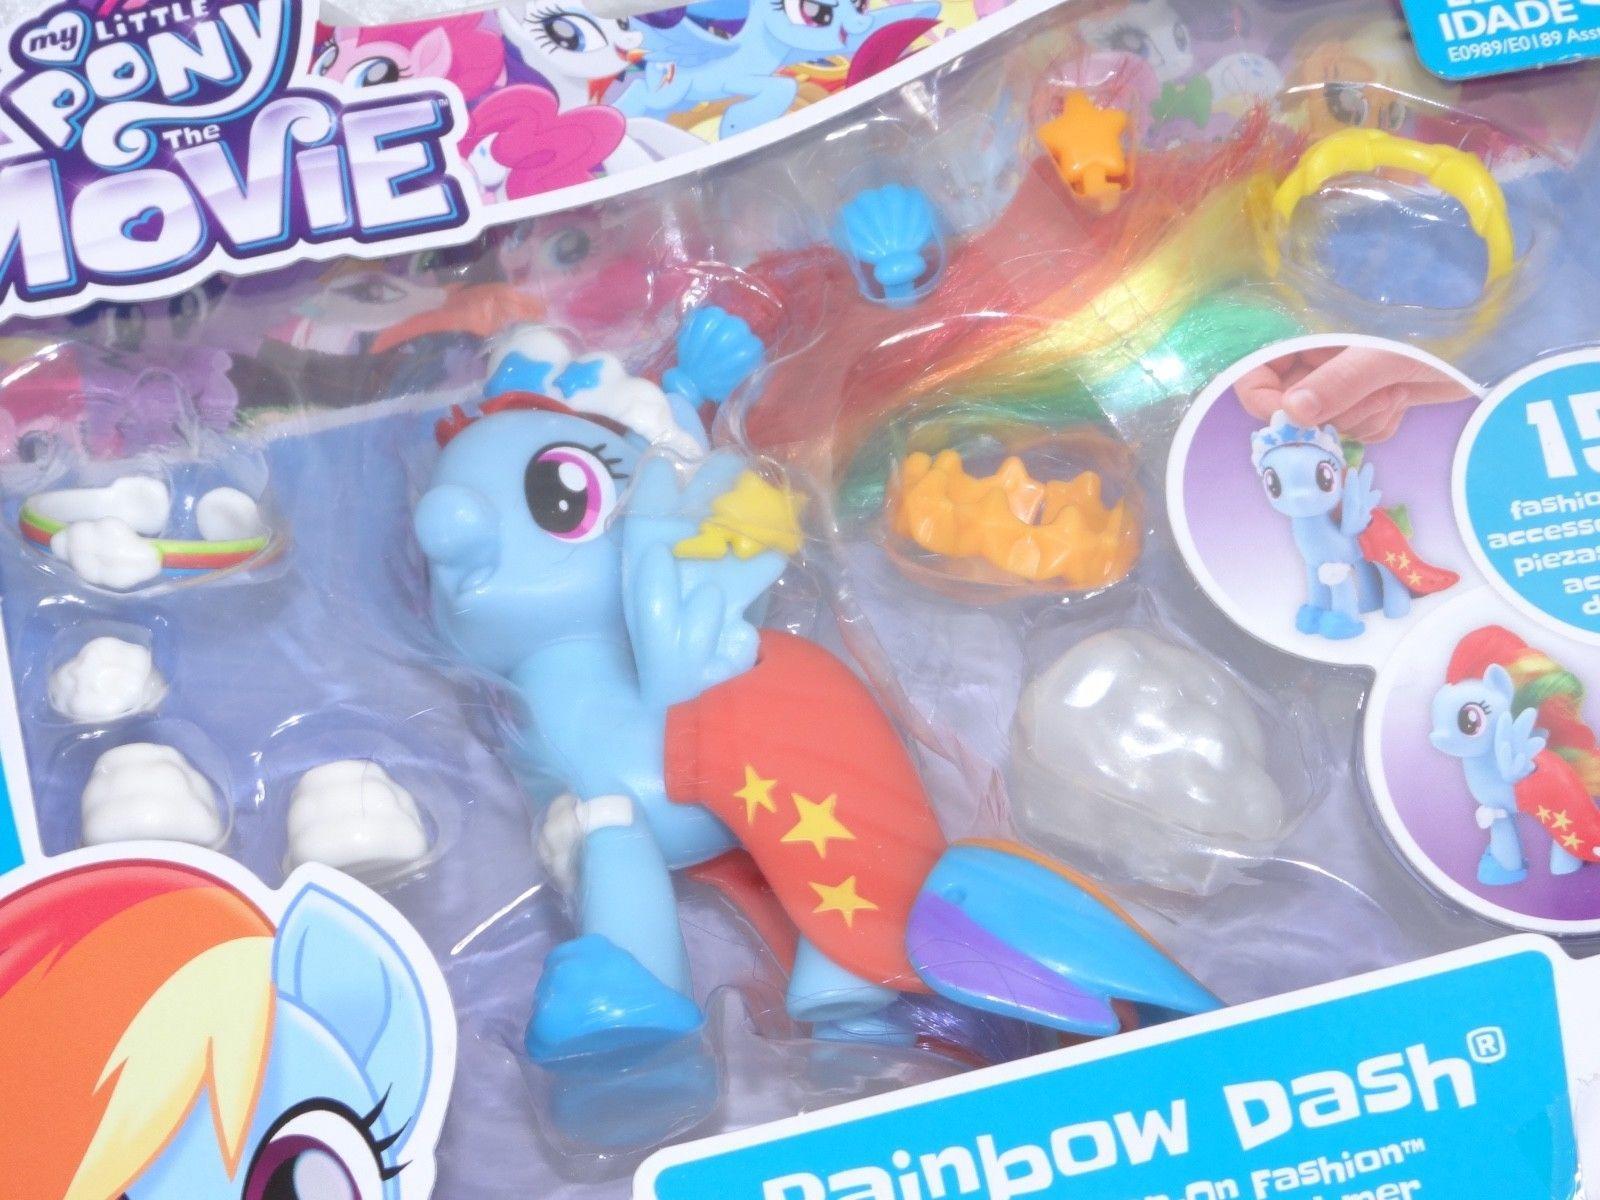 My Little Pony The Movie Rainbow Dash Land of Sea Snap On Fashion